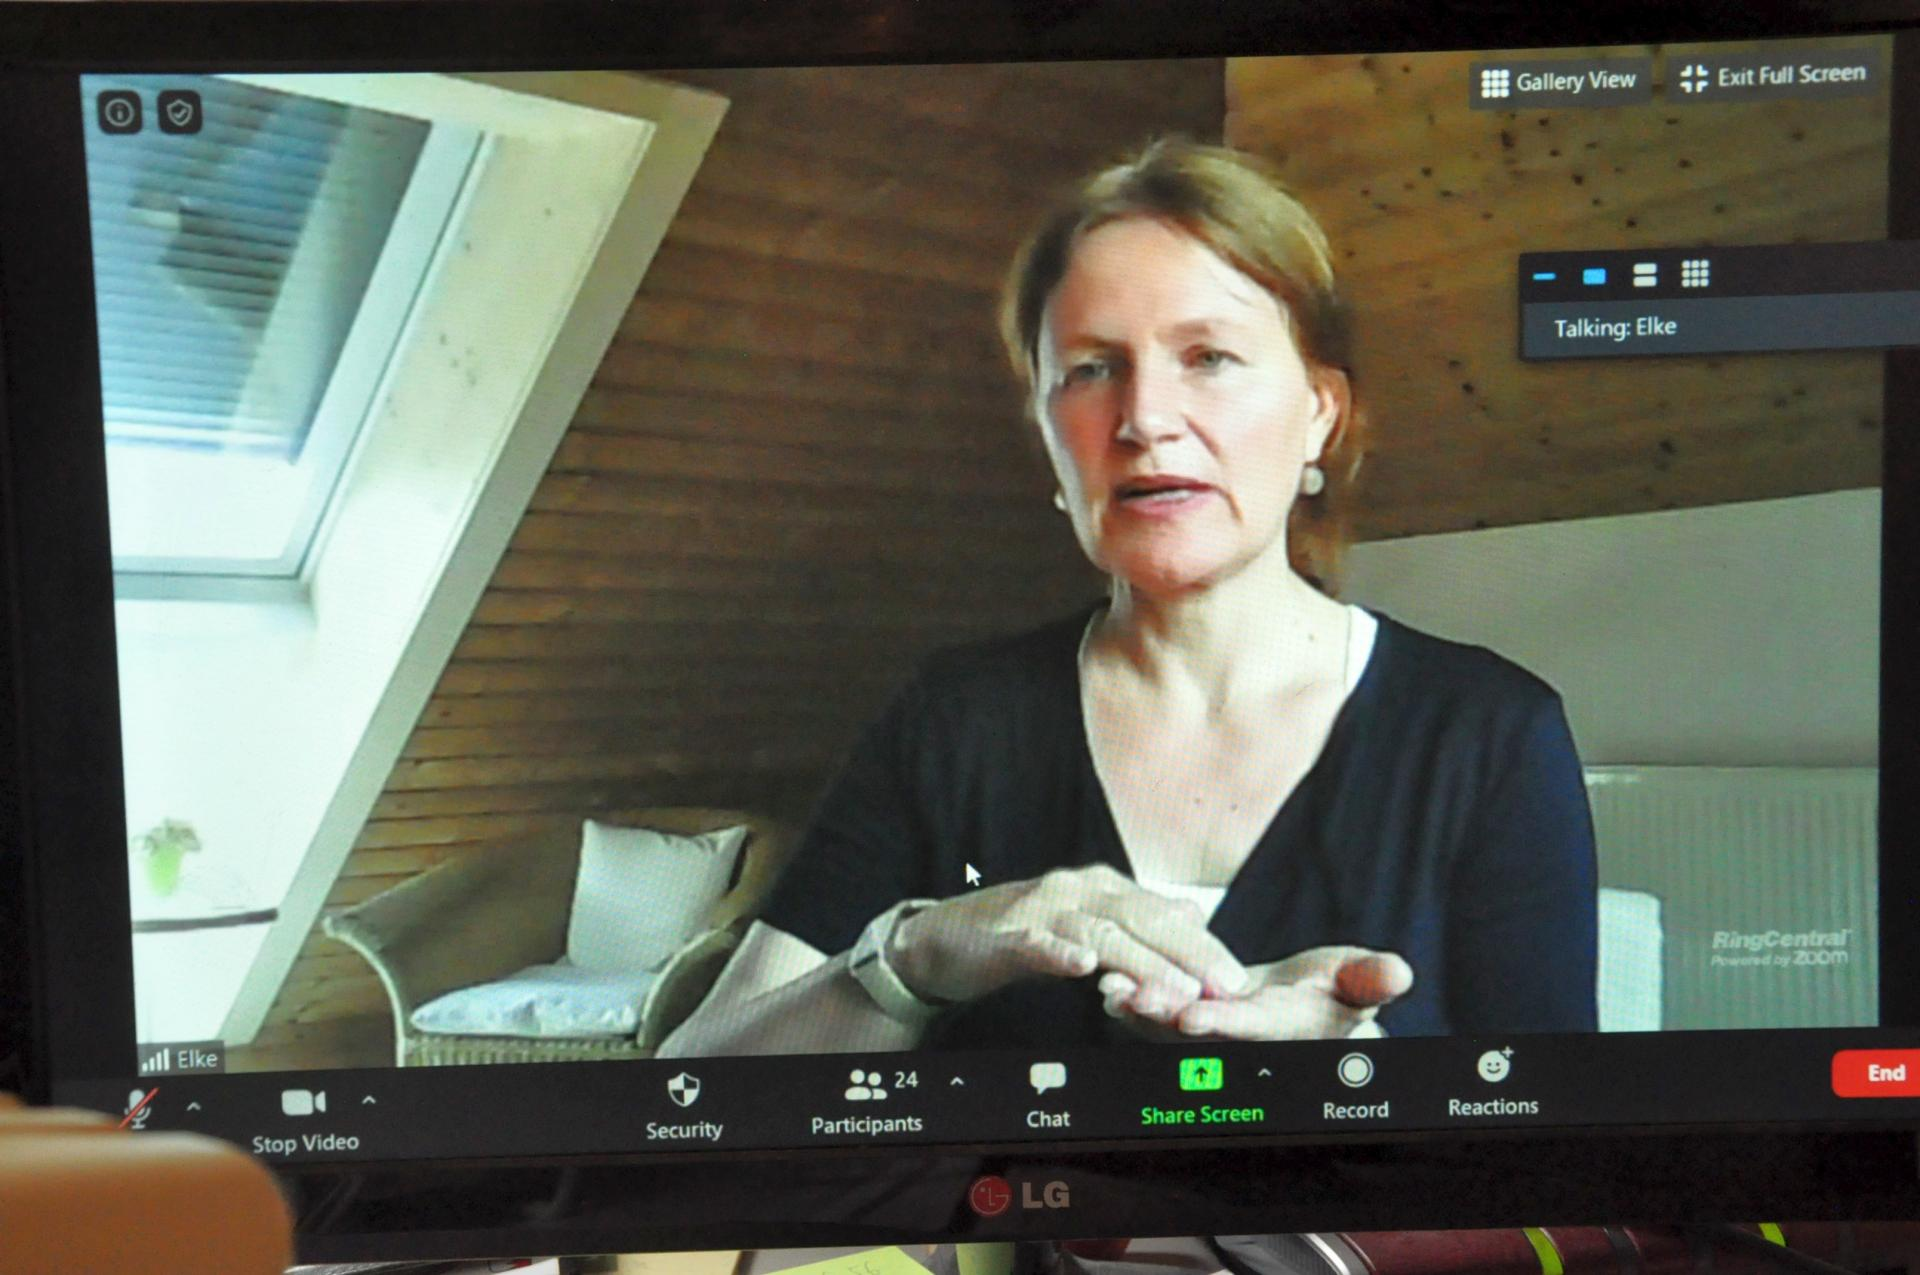 Elke Rosenzweig - Online